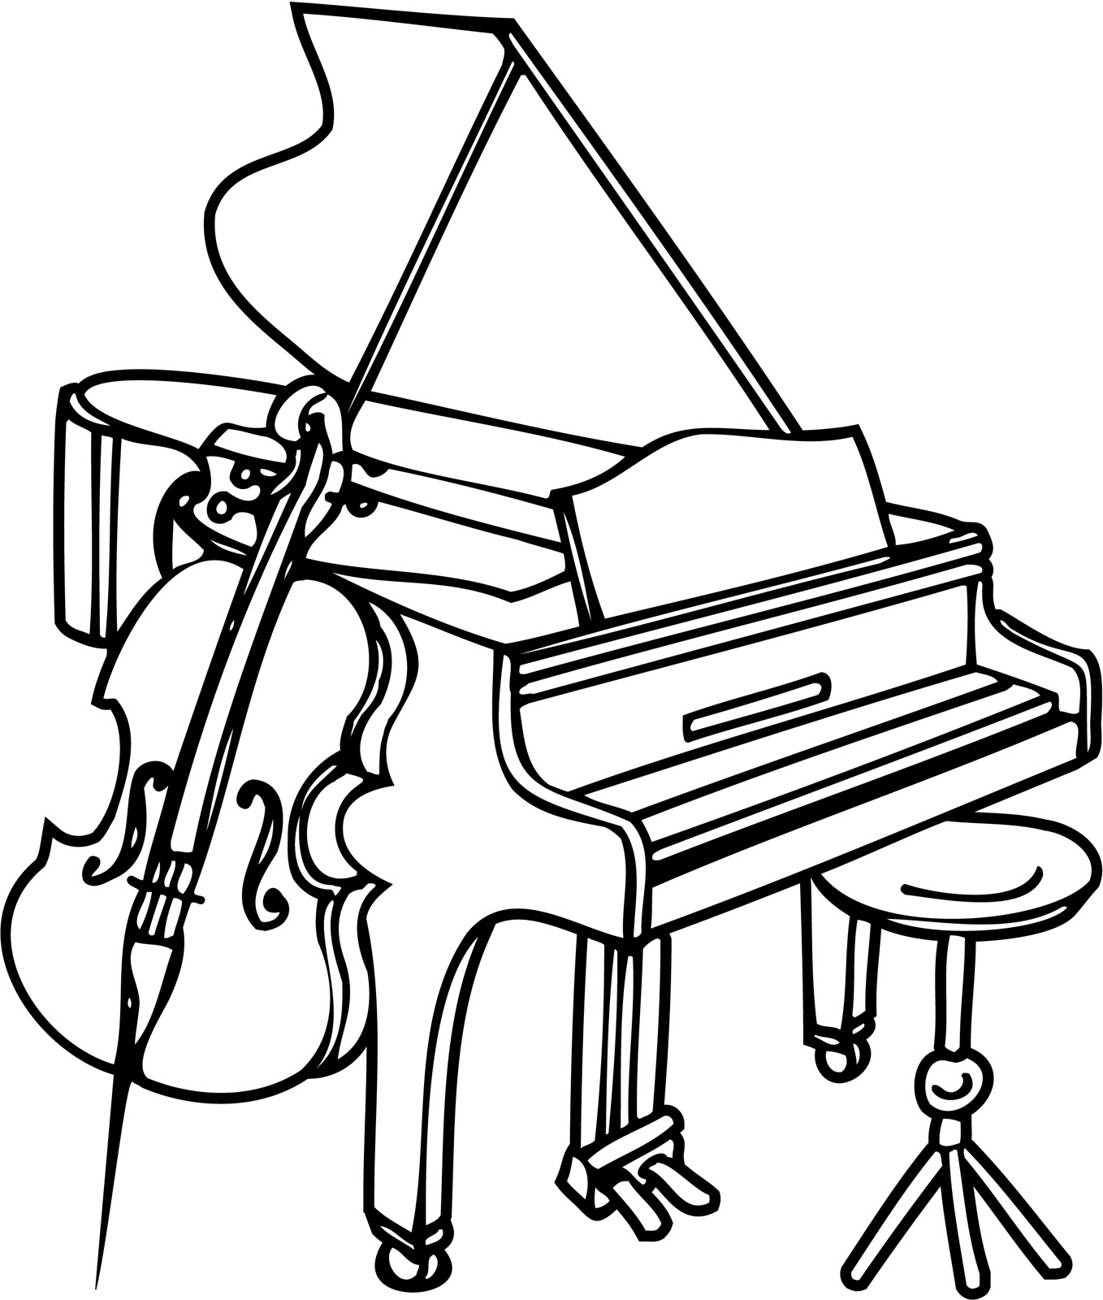 MUSIC-094